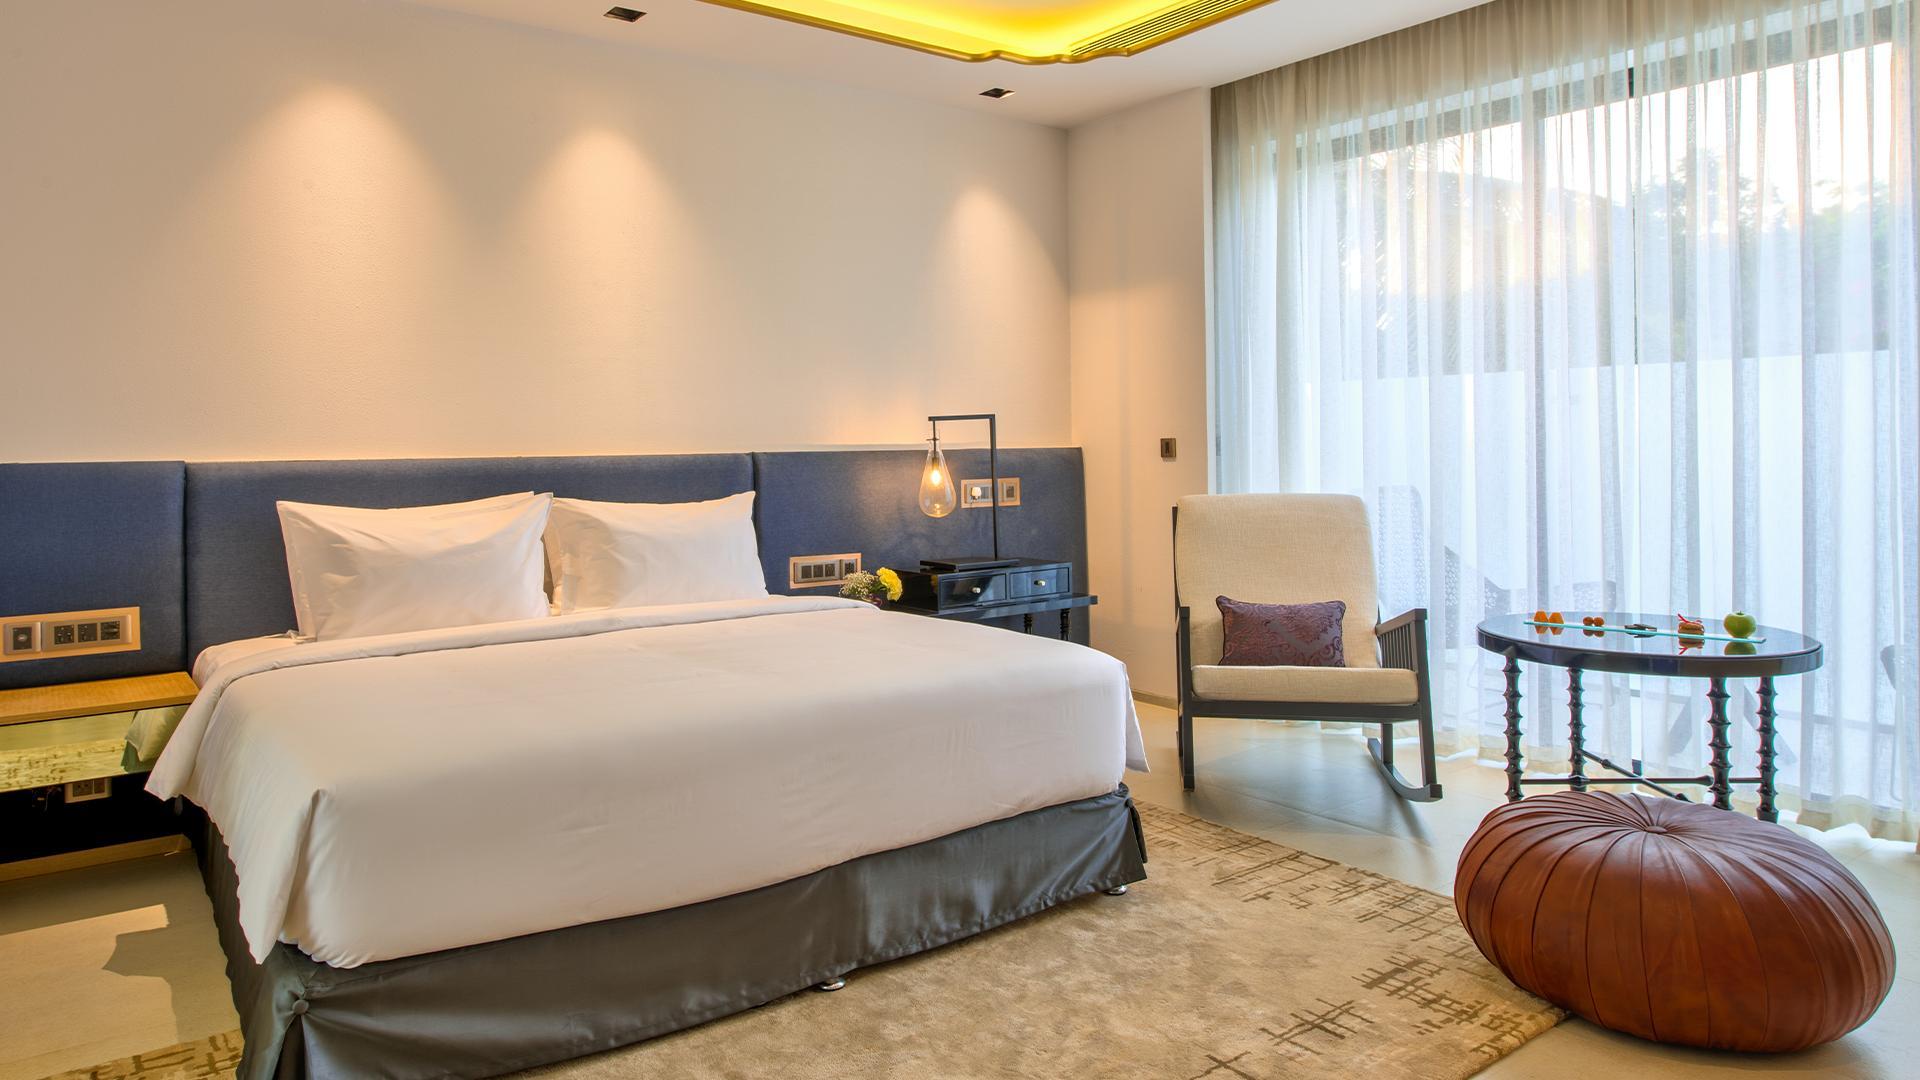 Essence Room image 1 at Azaya Beach Resort by South Goa, Goa, India